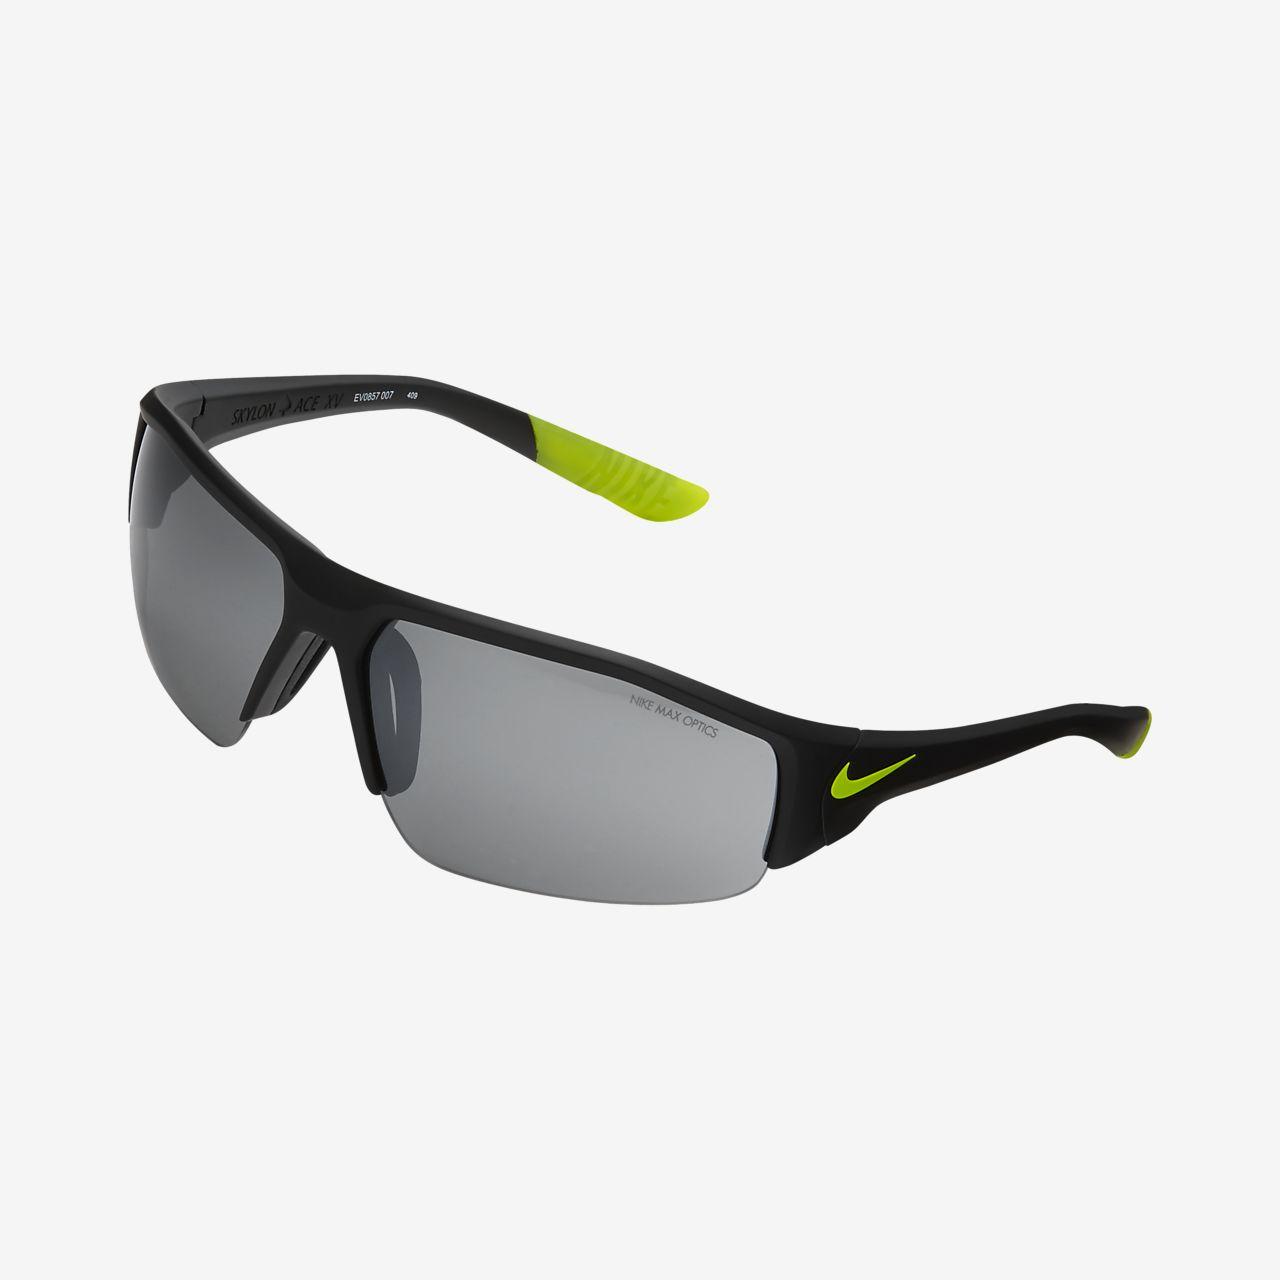 Nike Skylon Ace XV Sunglasses